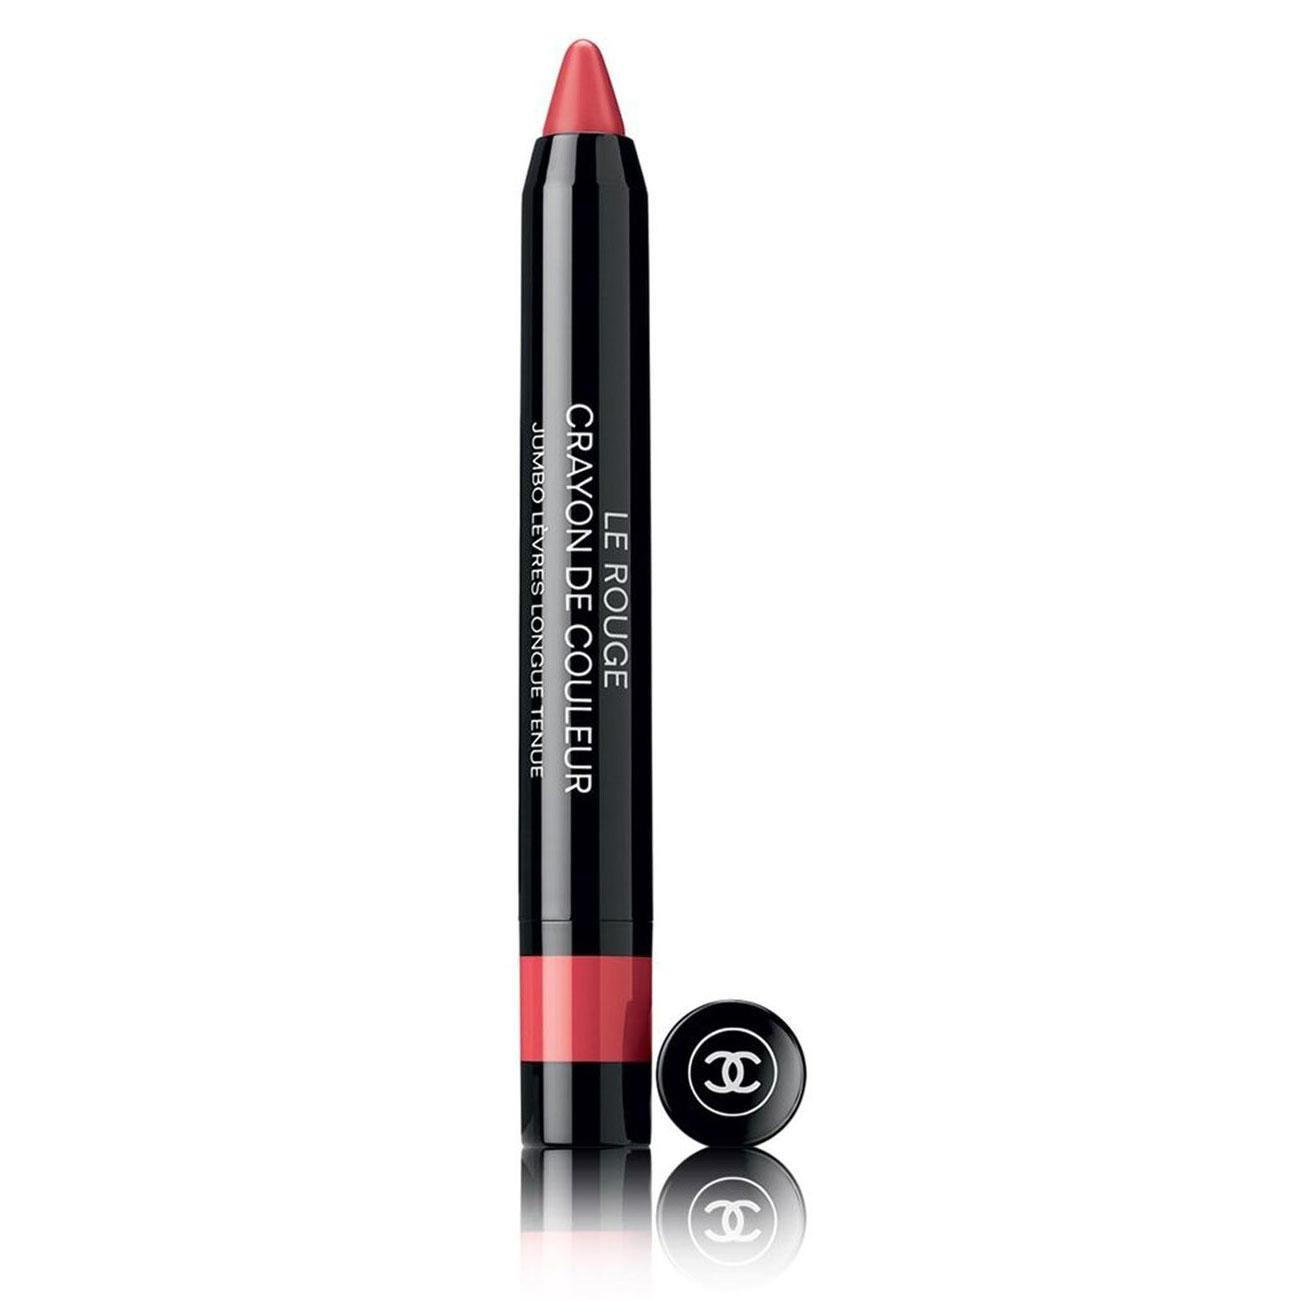 Chanel Jumbo Longwear Lip Crayon Rose Clair No. 3